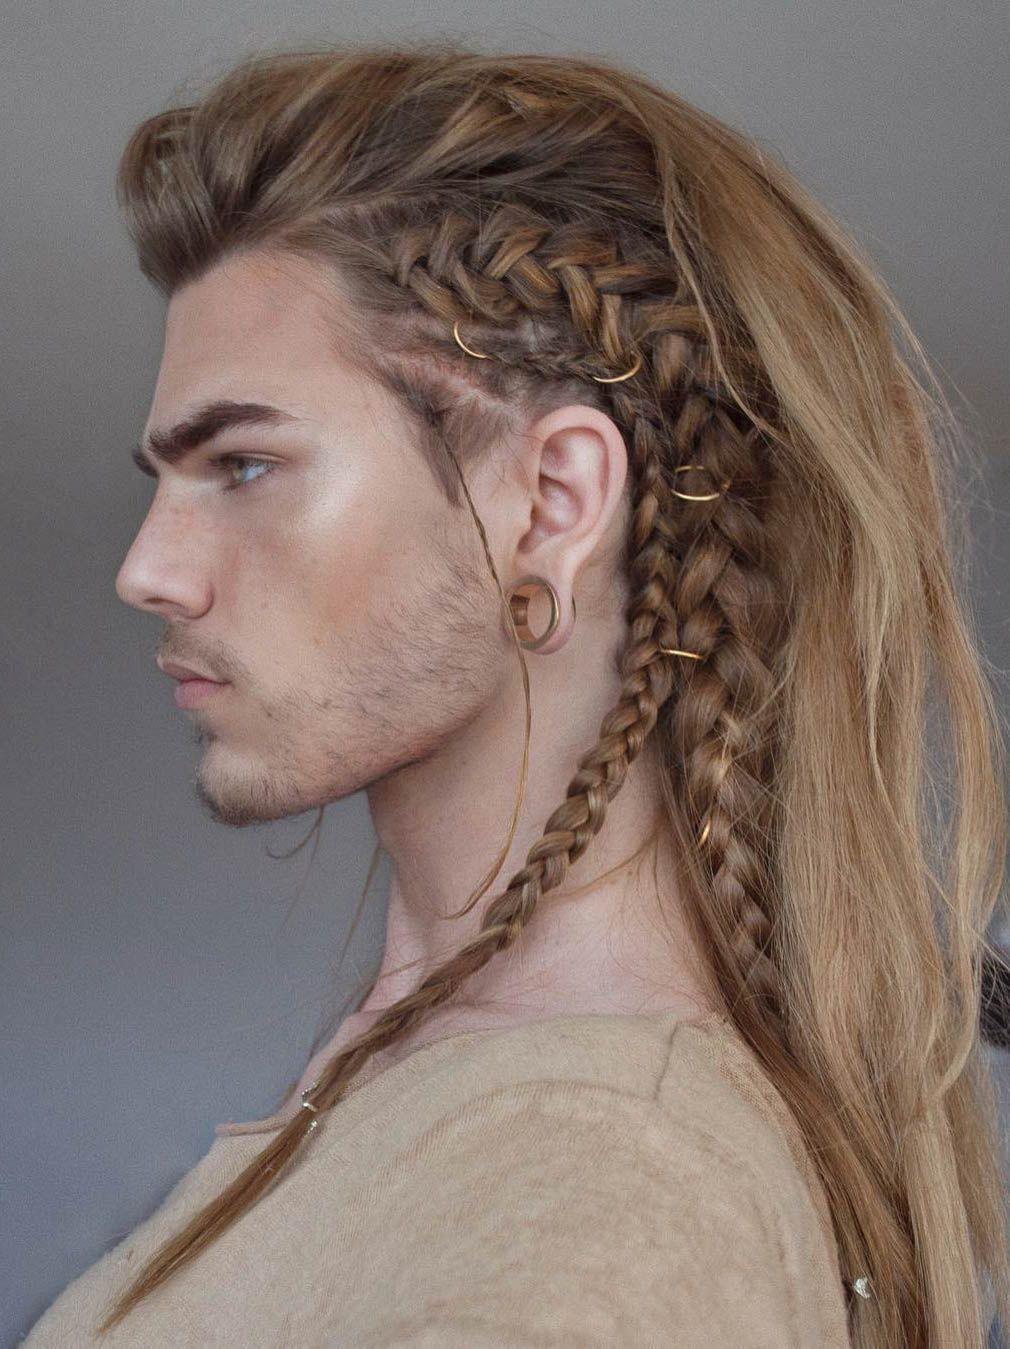 10+ Modern Long Hairstyles For Men